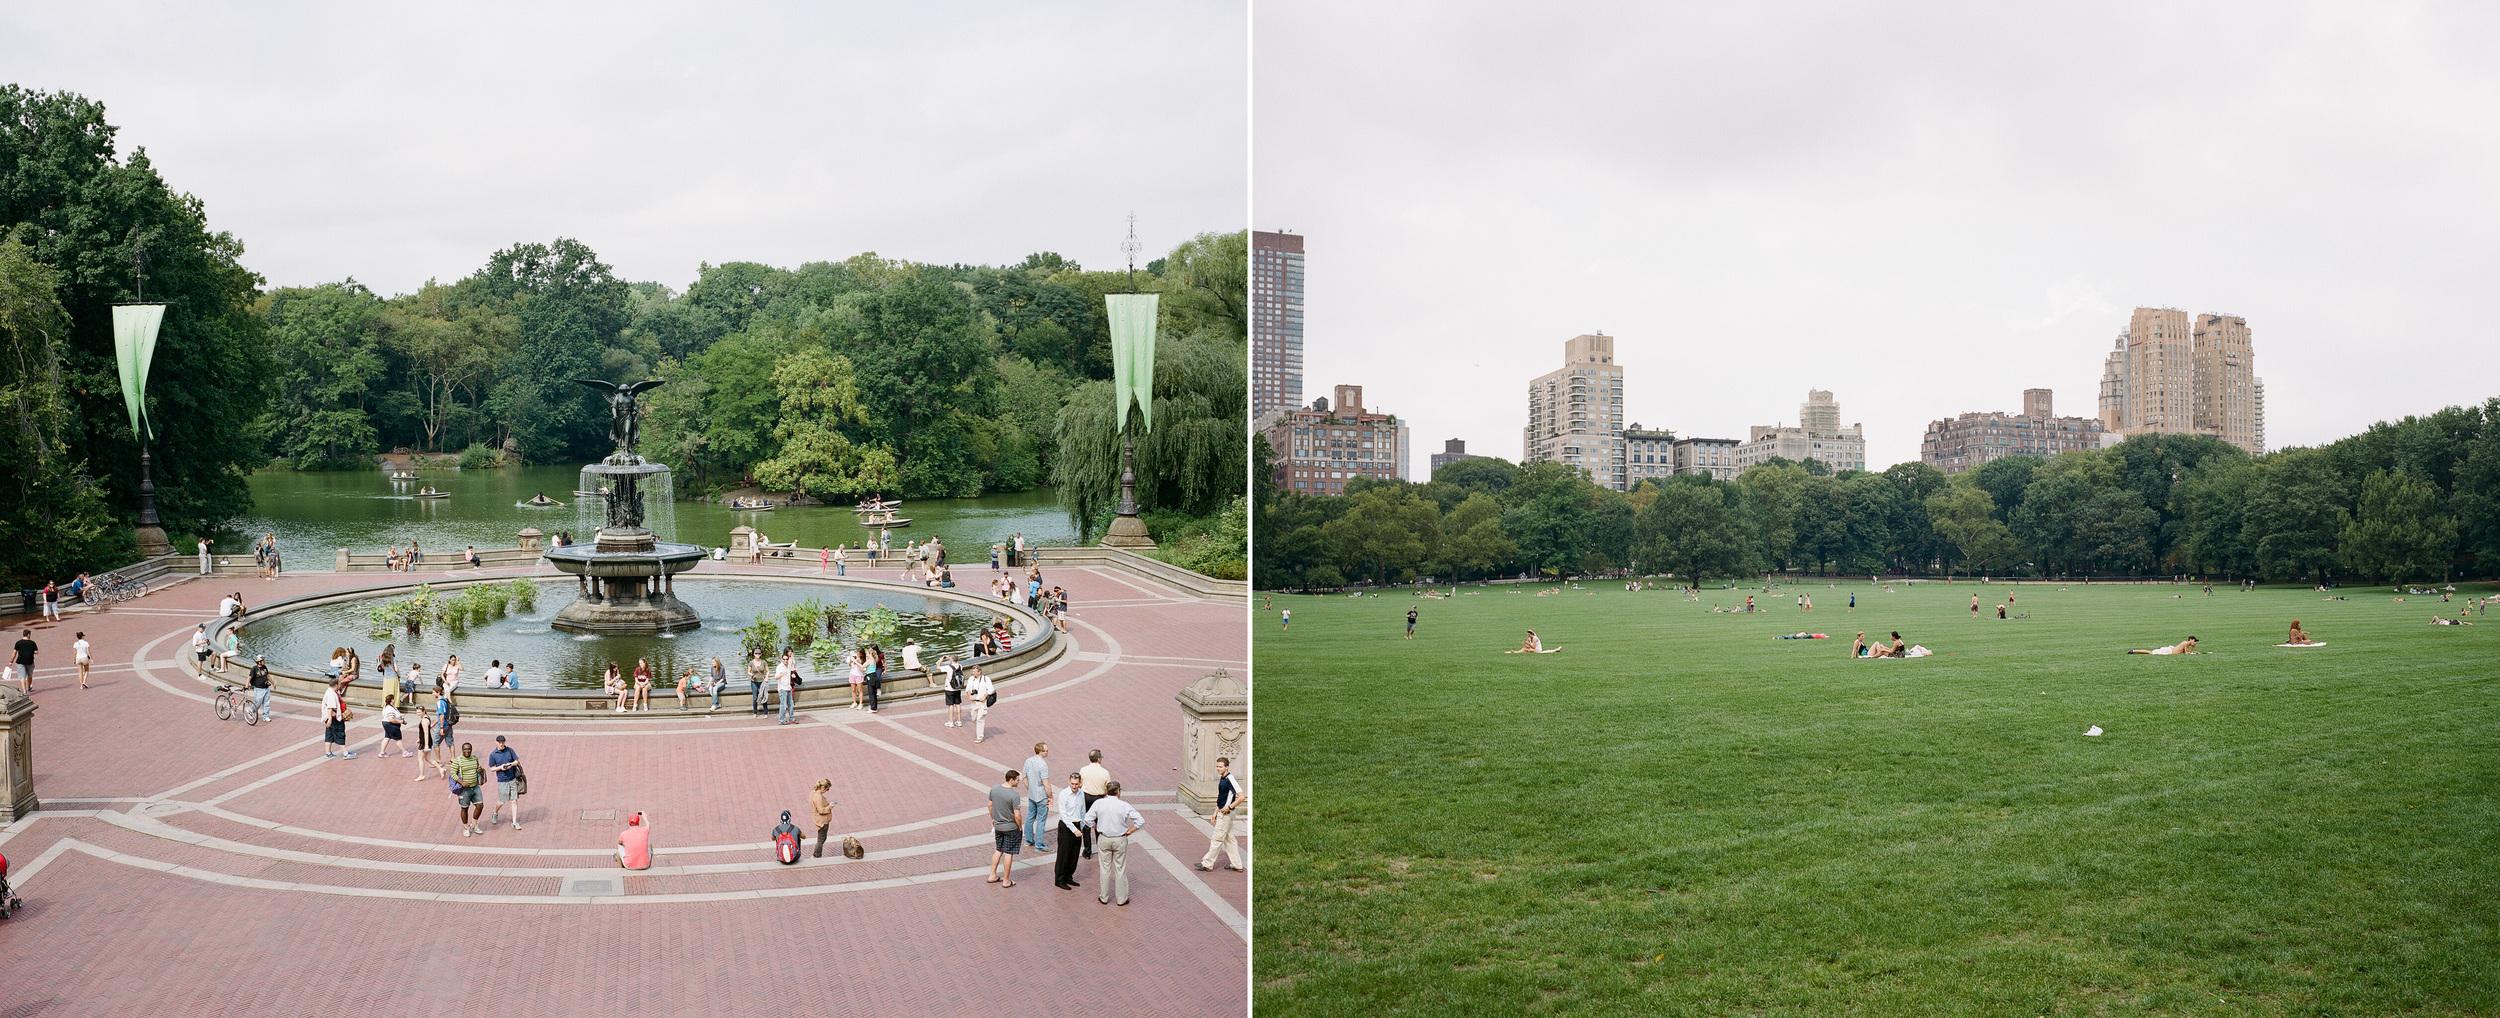 NYC-01.jpg